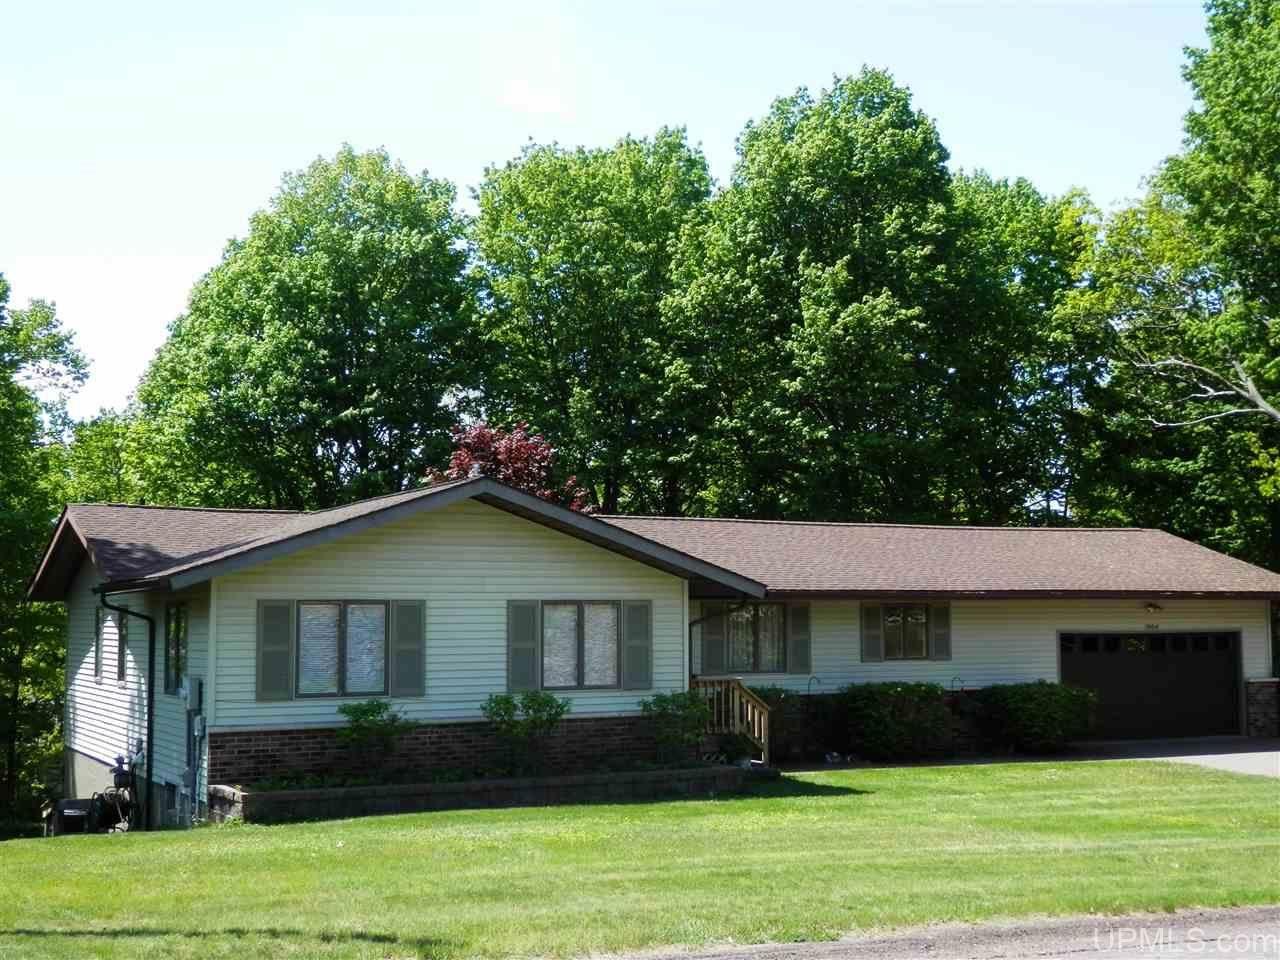 Photo of 1004 Crestwood, Hancock, MI 49930-1135 (MLS # 1126730)